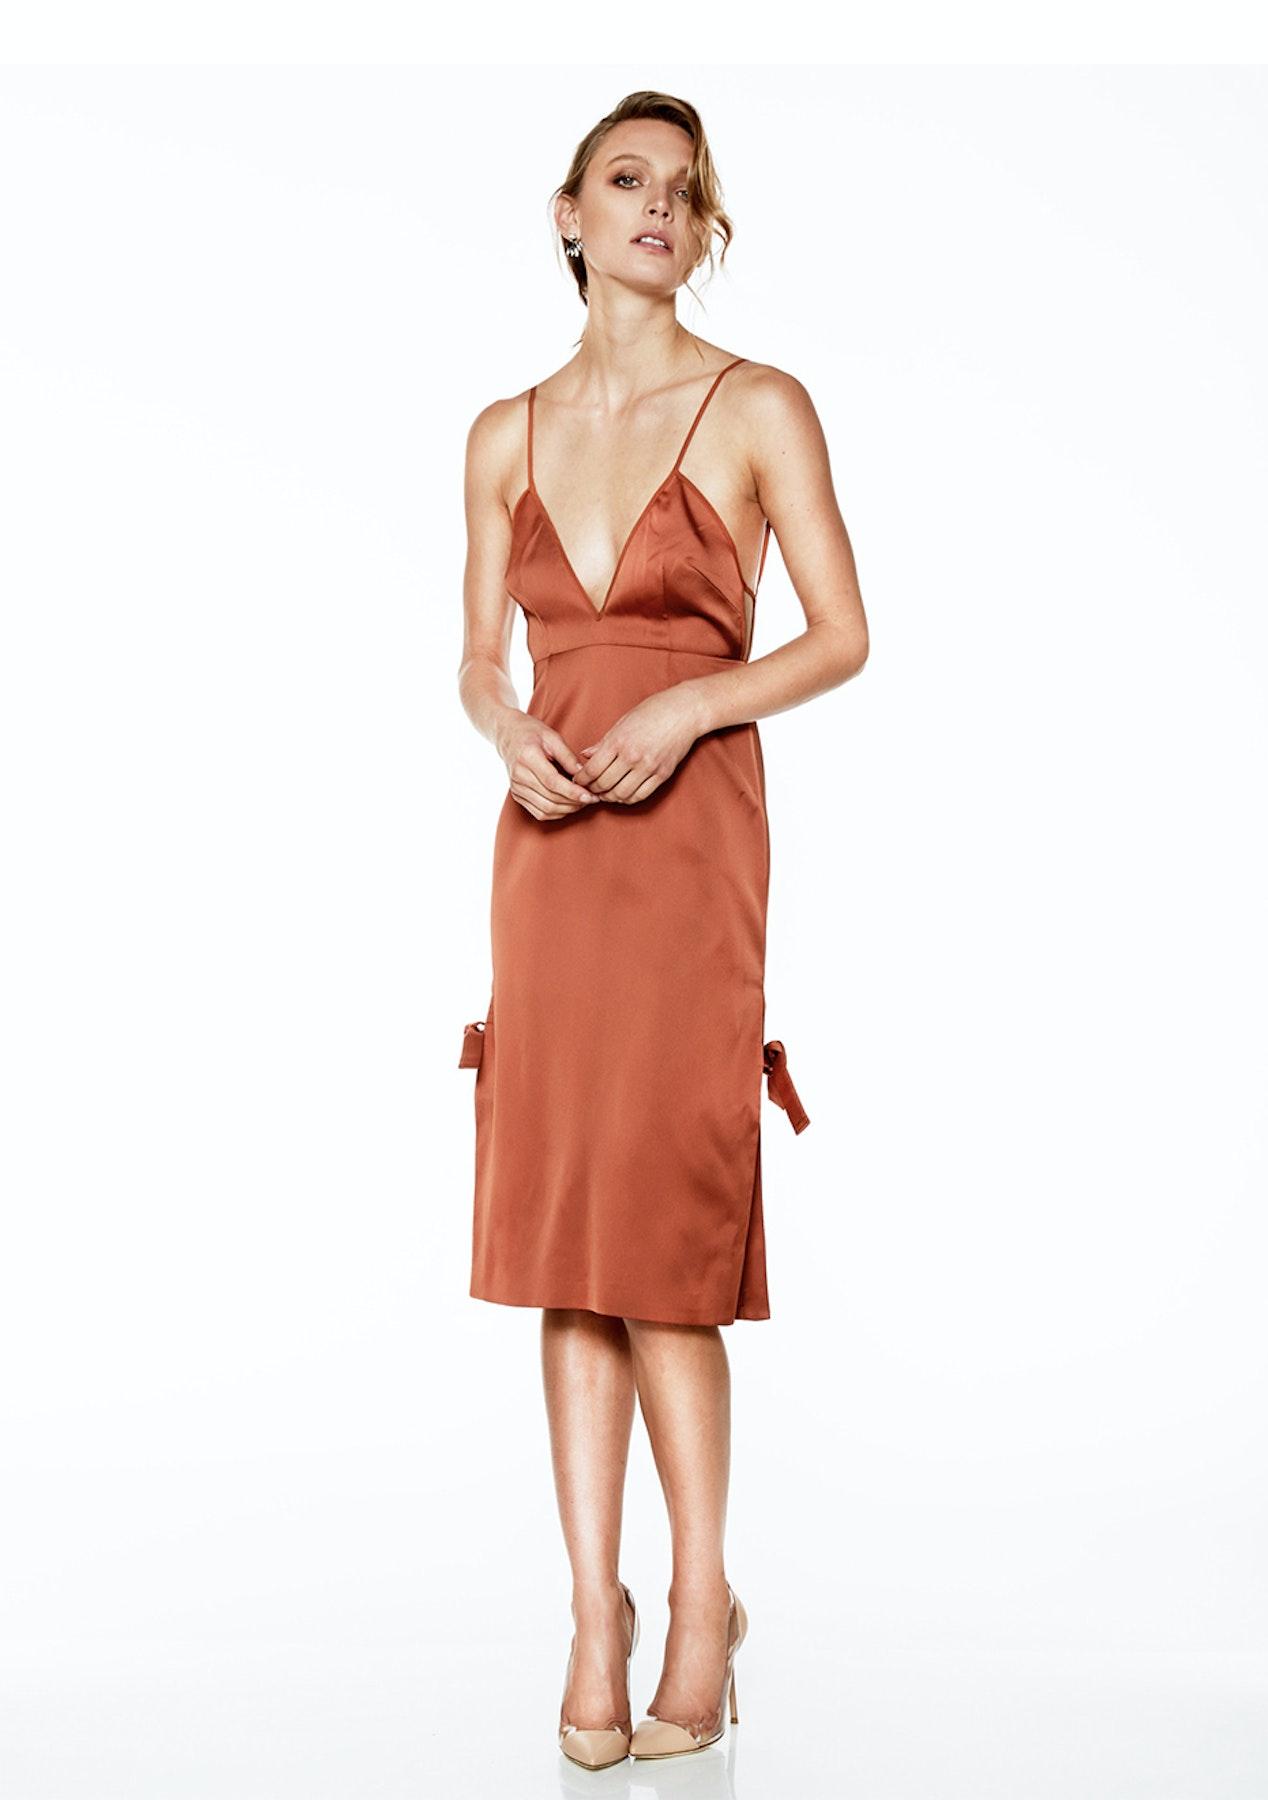 53c56811895e0 Talulah - Hartley Midi Dress - Bronze - Stevie May, Isla & Talulah - Onceit